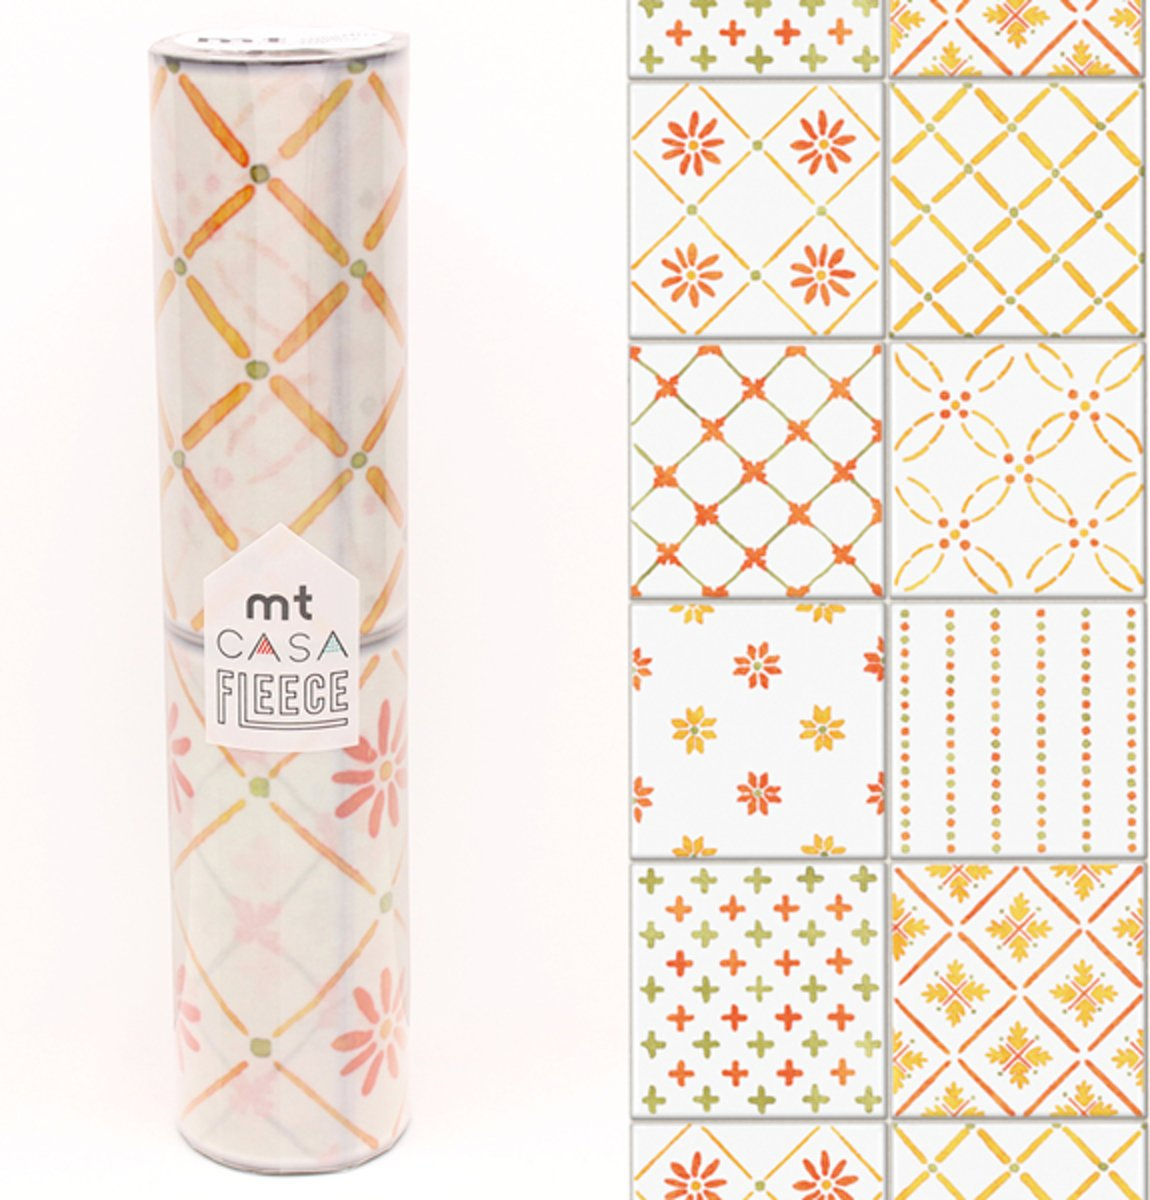 MT Casa Fleece tile orange